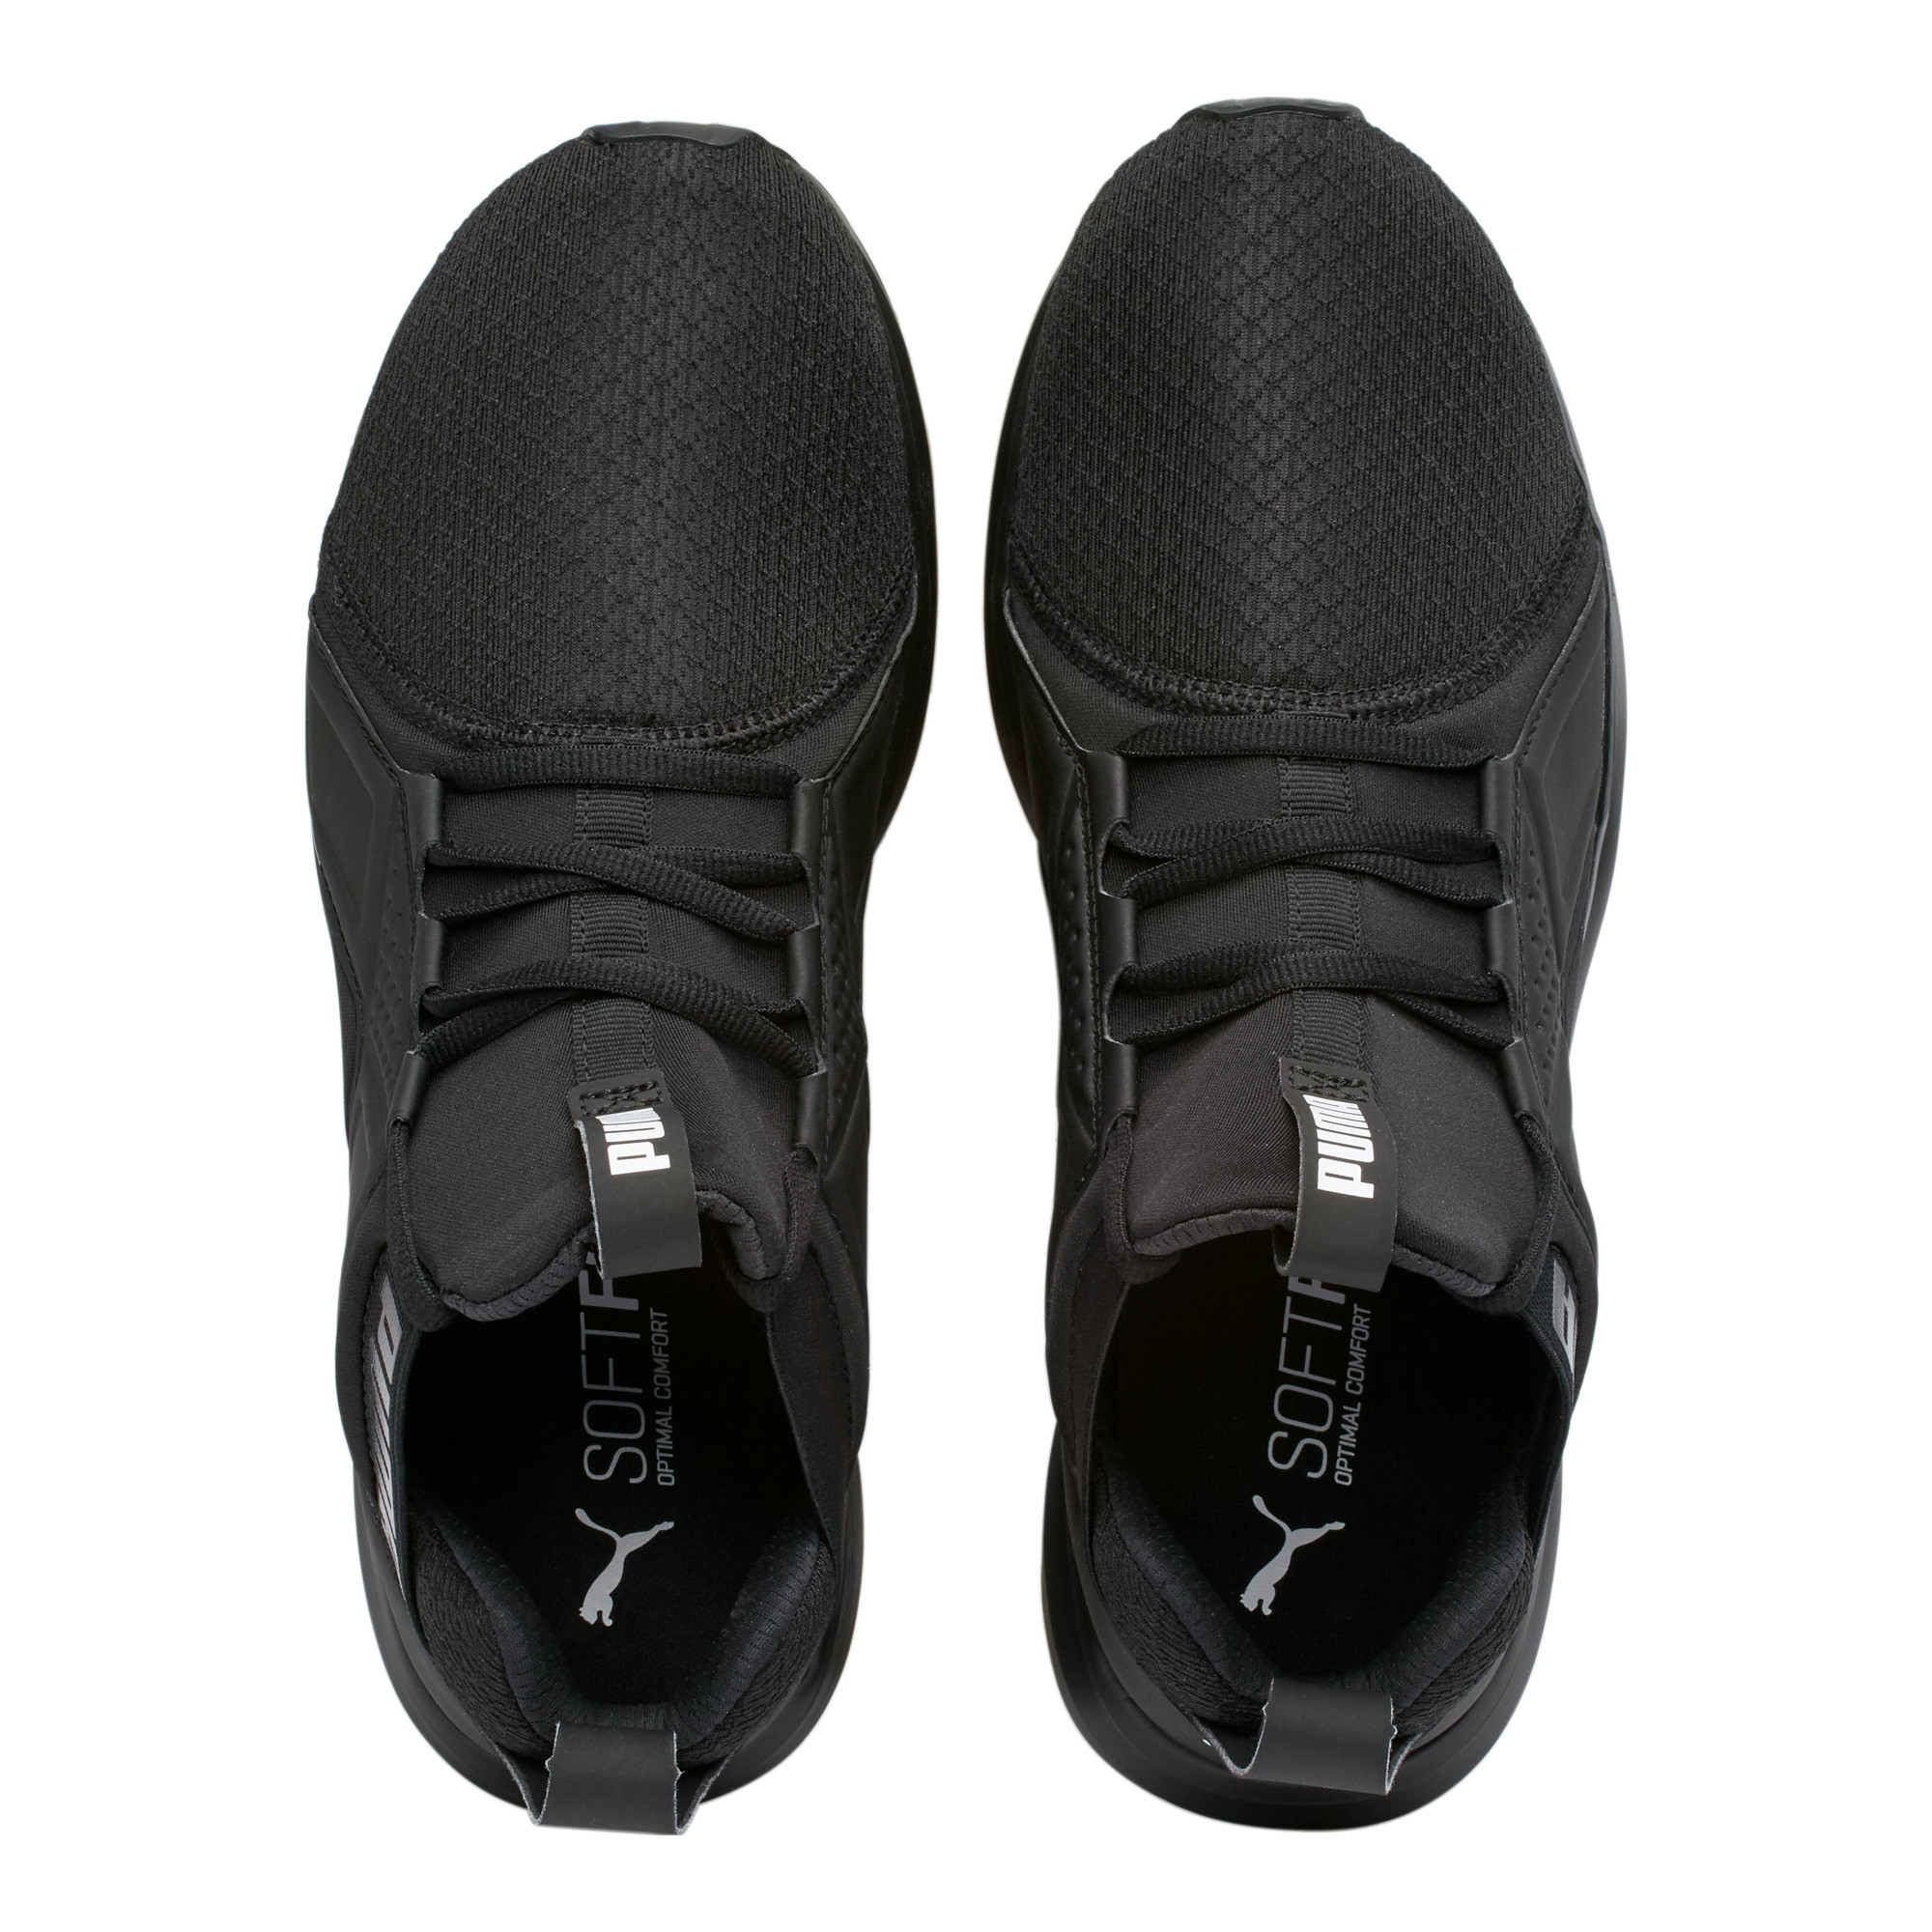 PUMA-Men-039-s-Enzo-Training-Shoes thumbnail 7